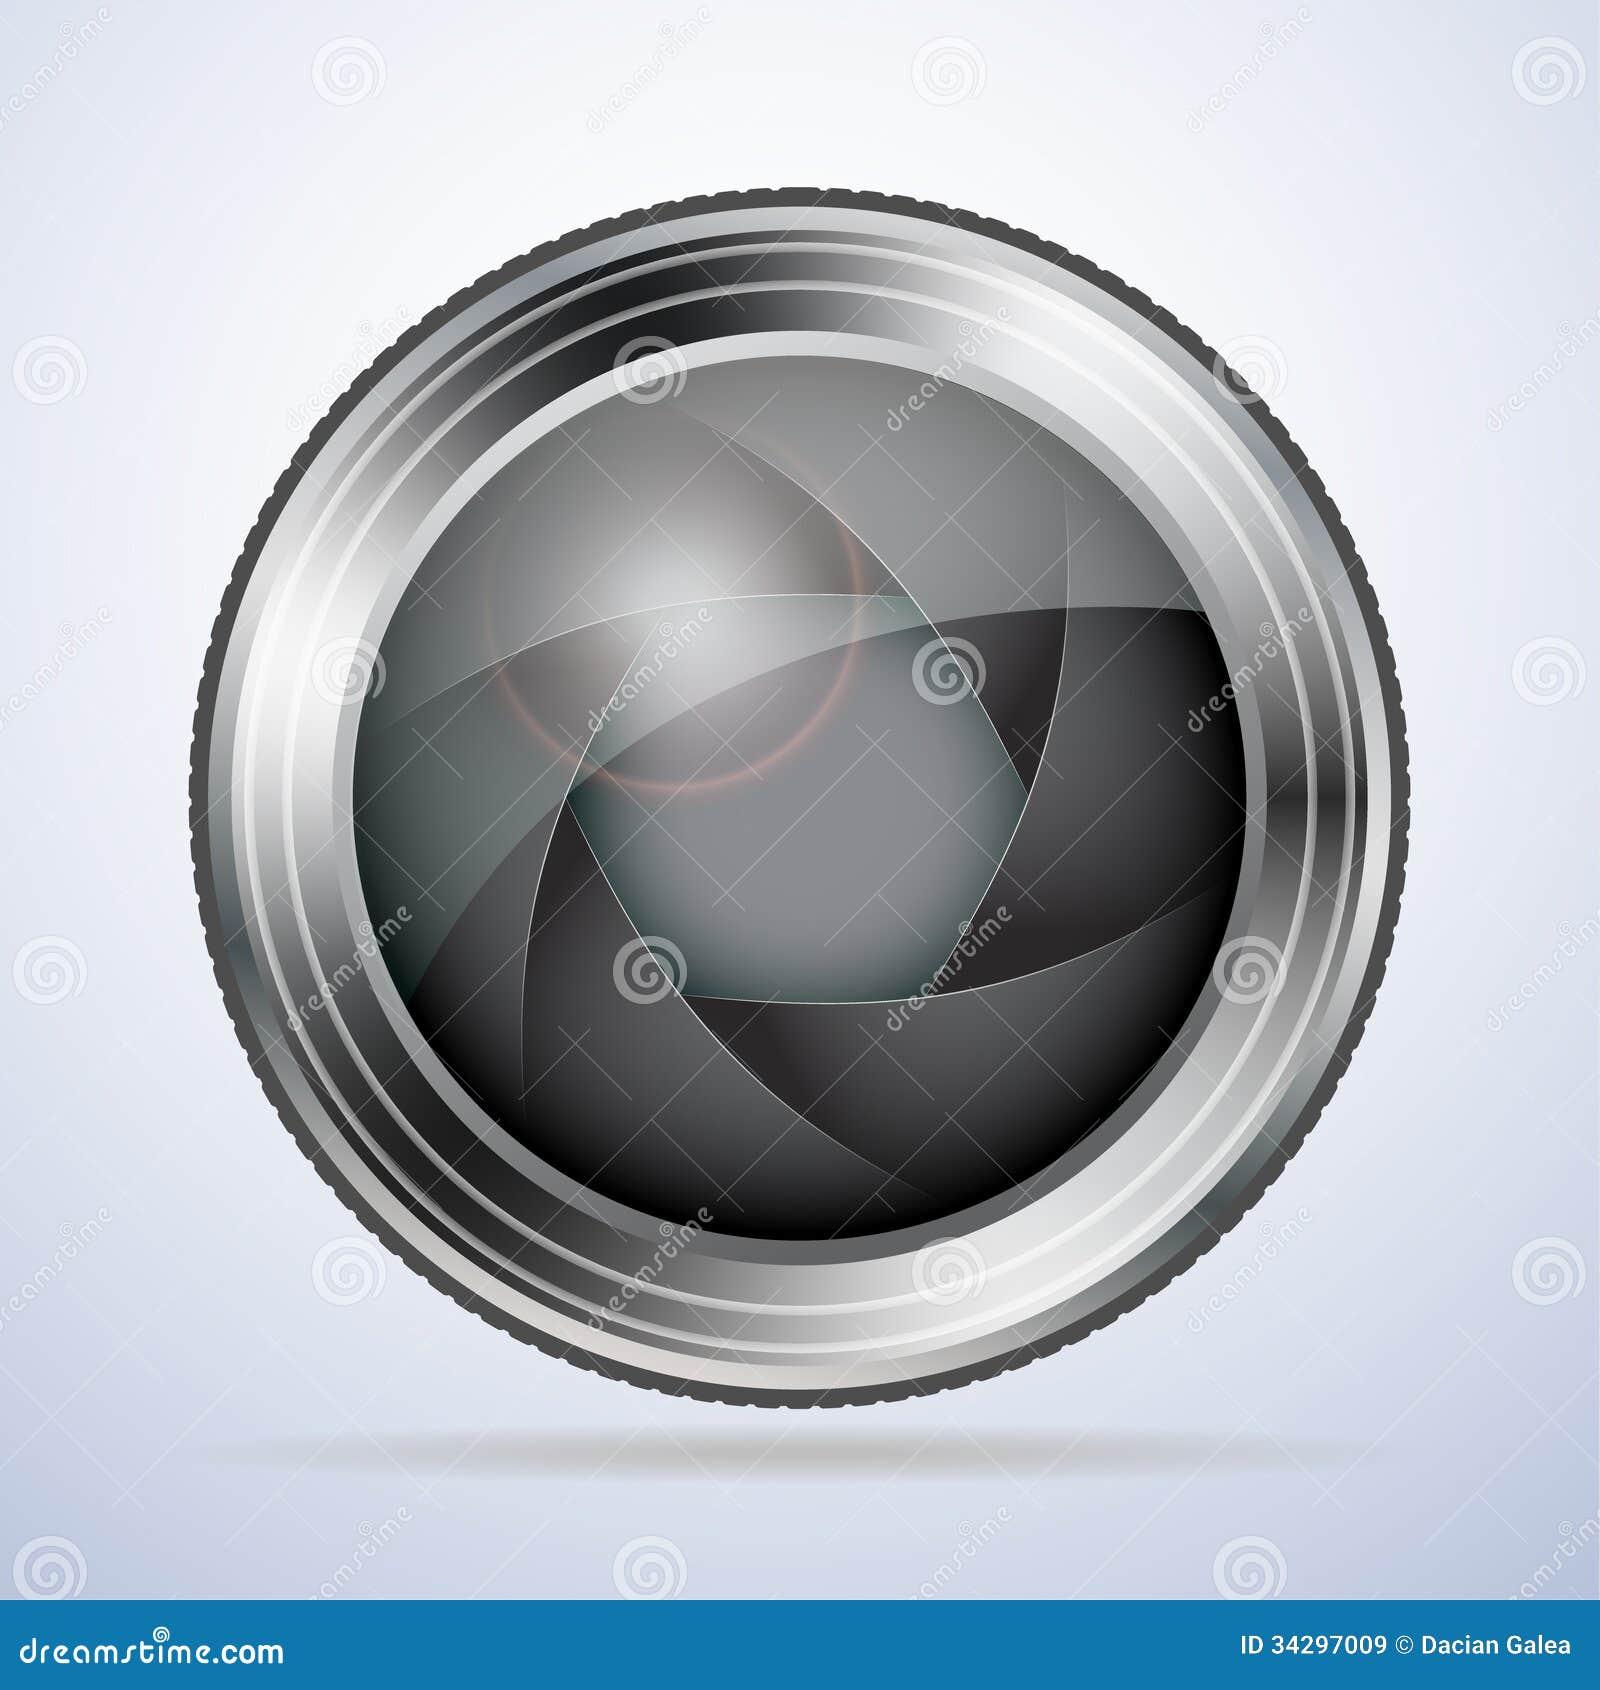 Camera lens with aperture